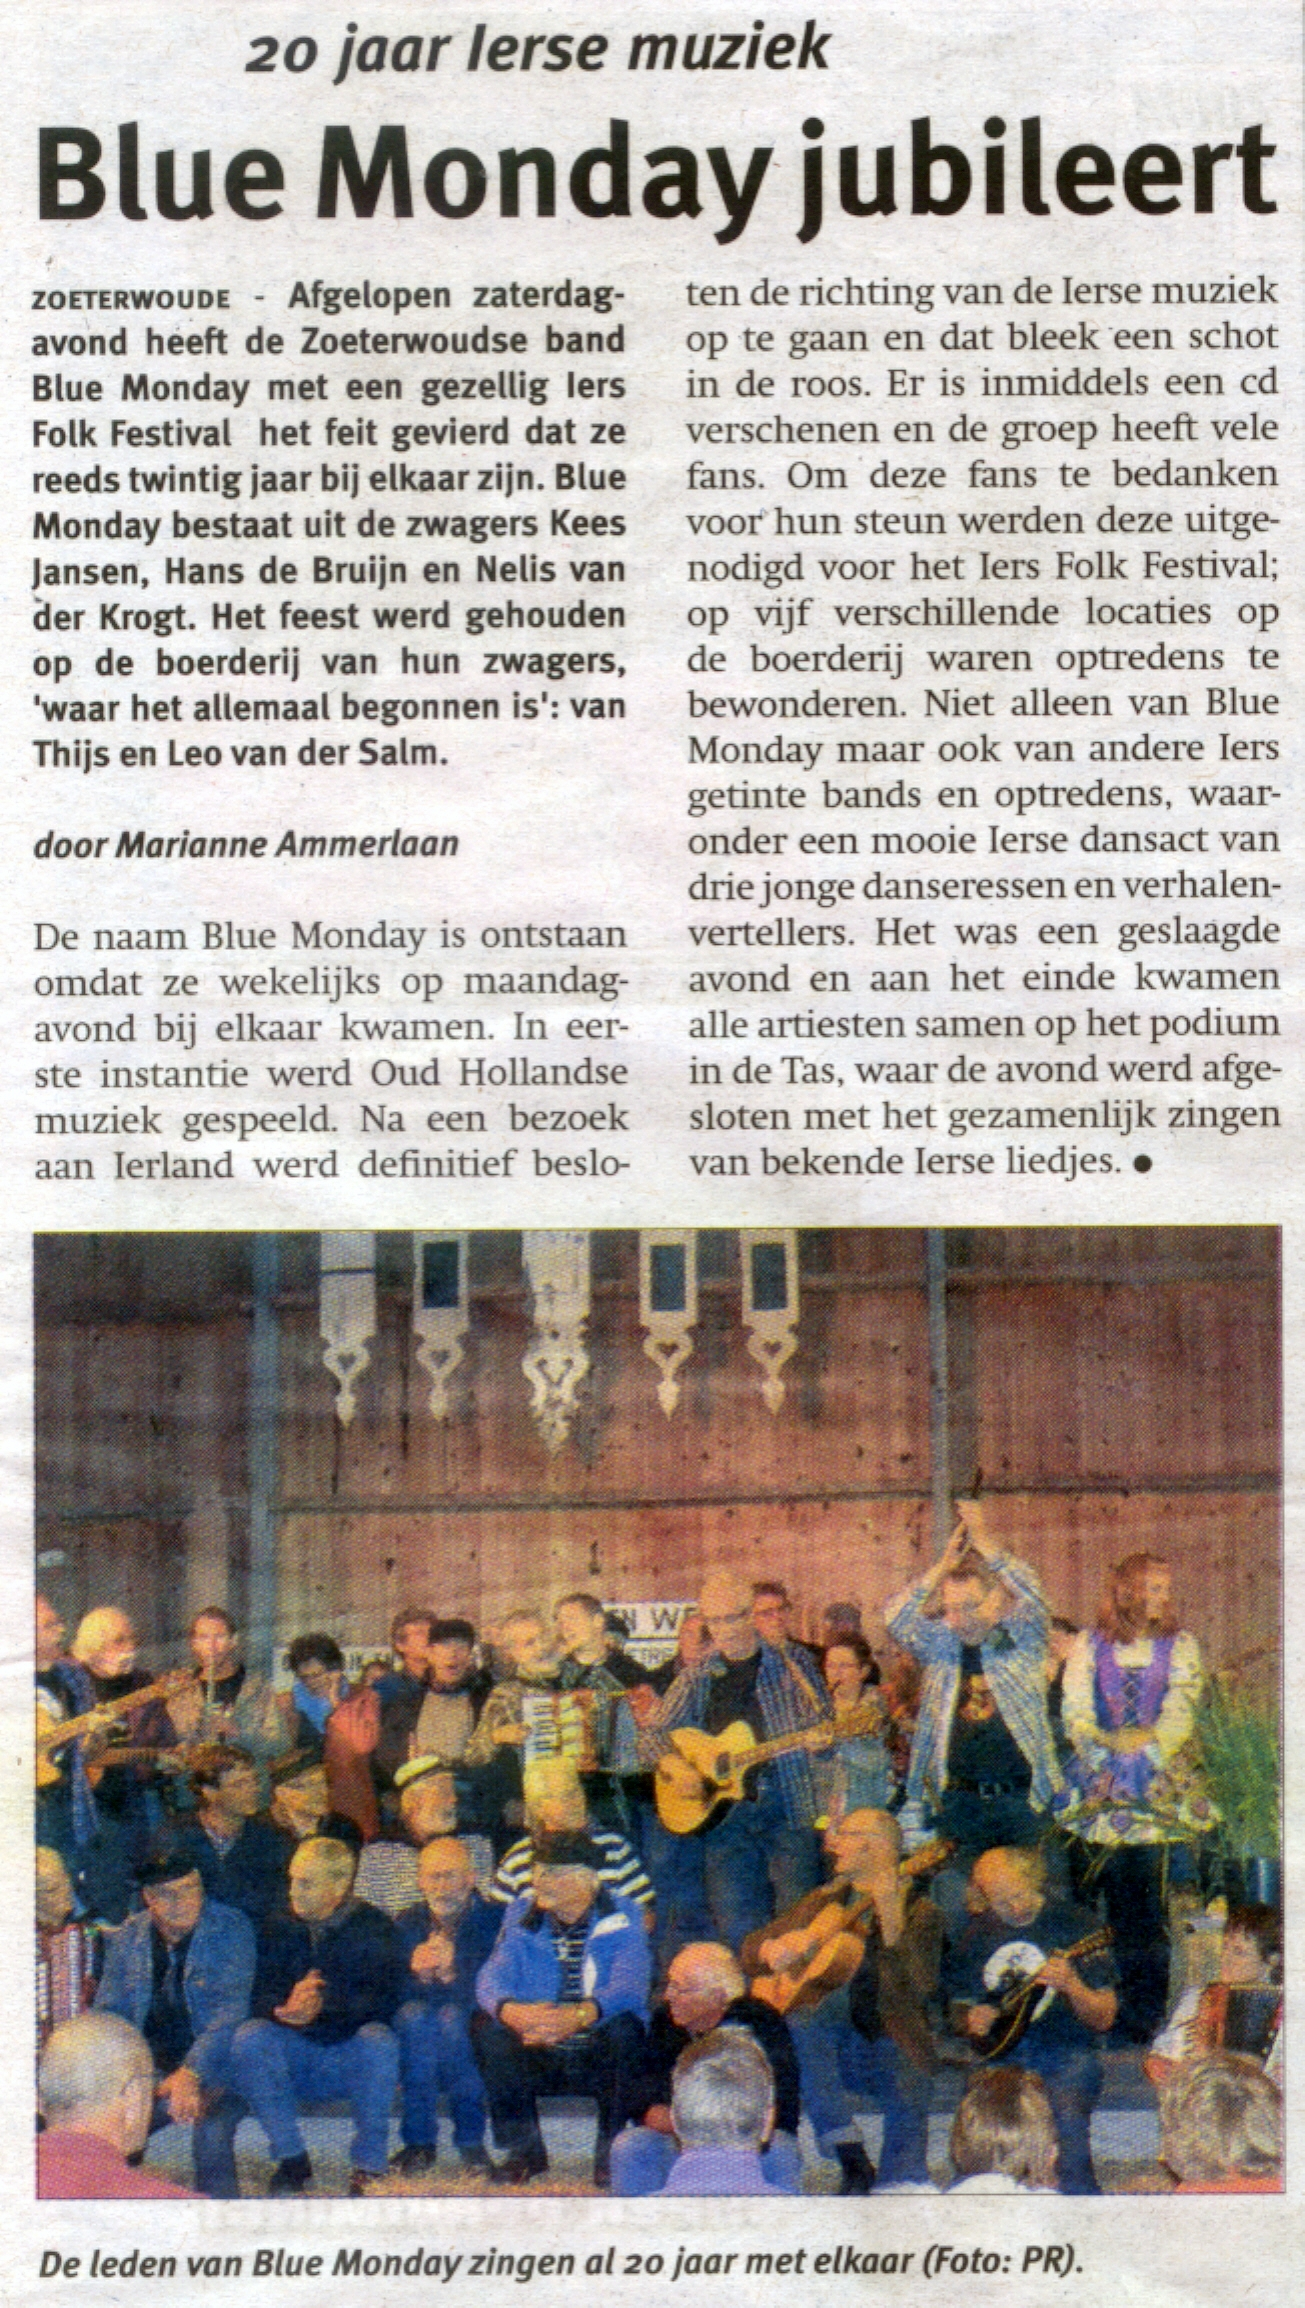 Leids-Nieuwsblad Festival 2011